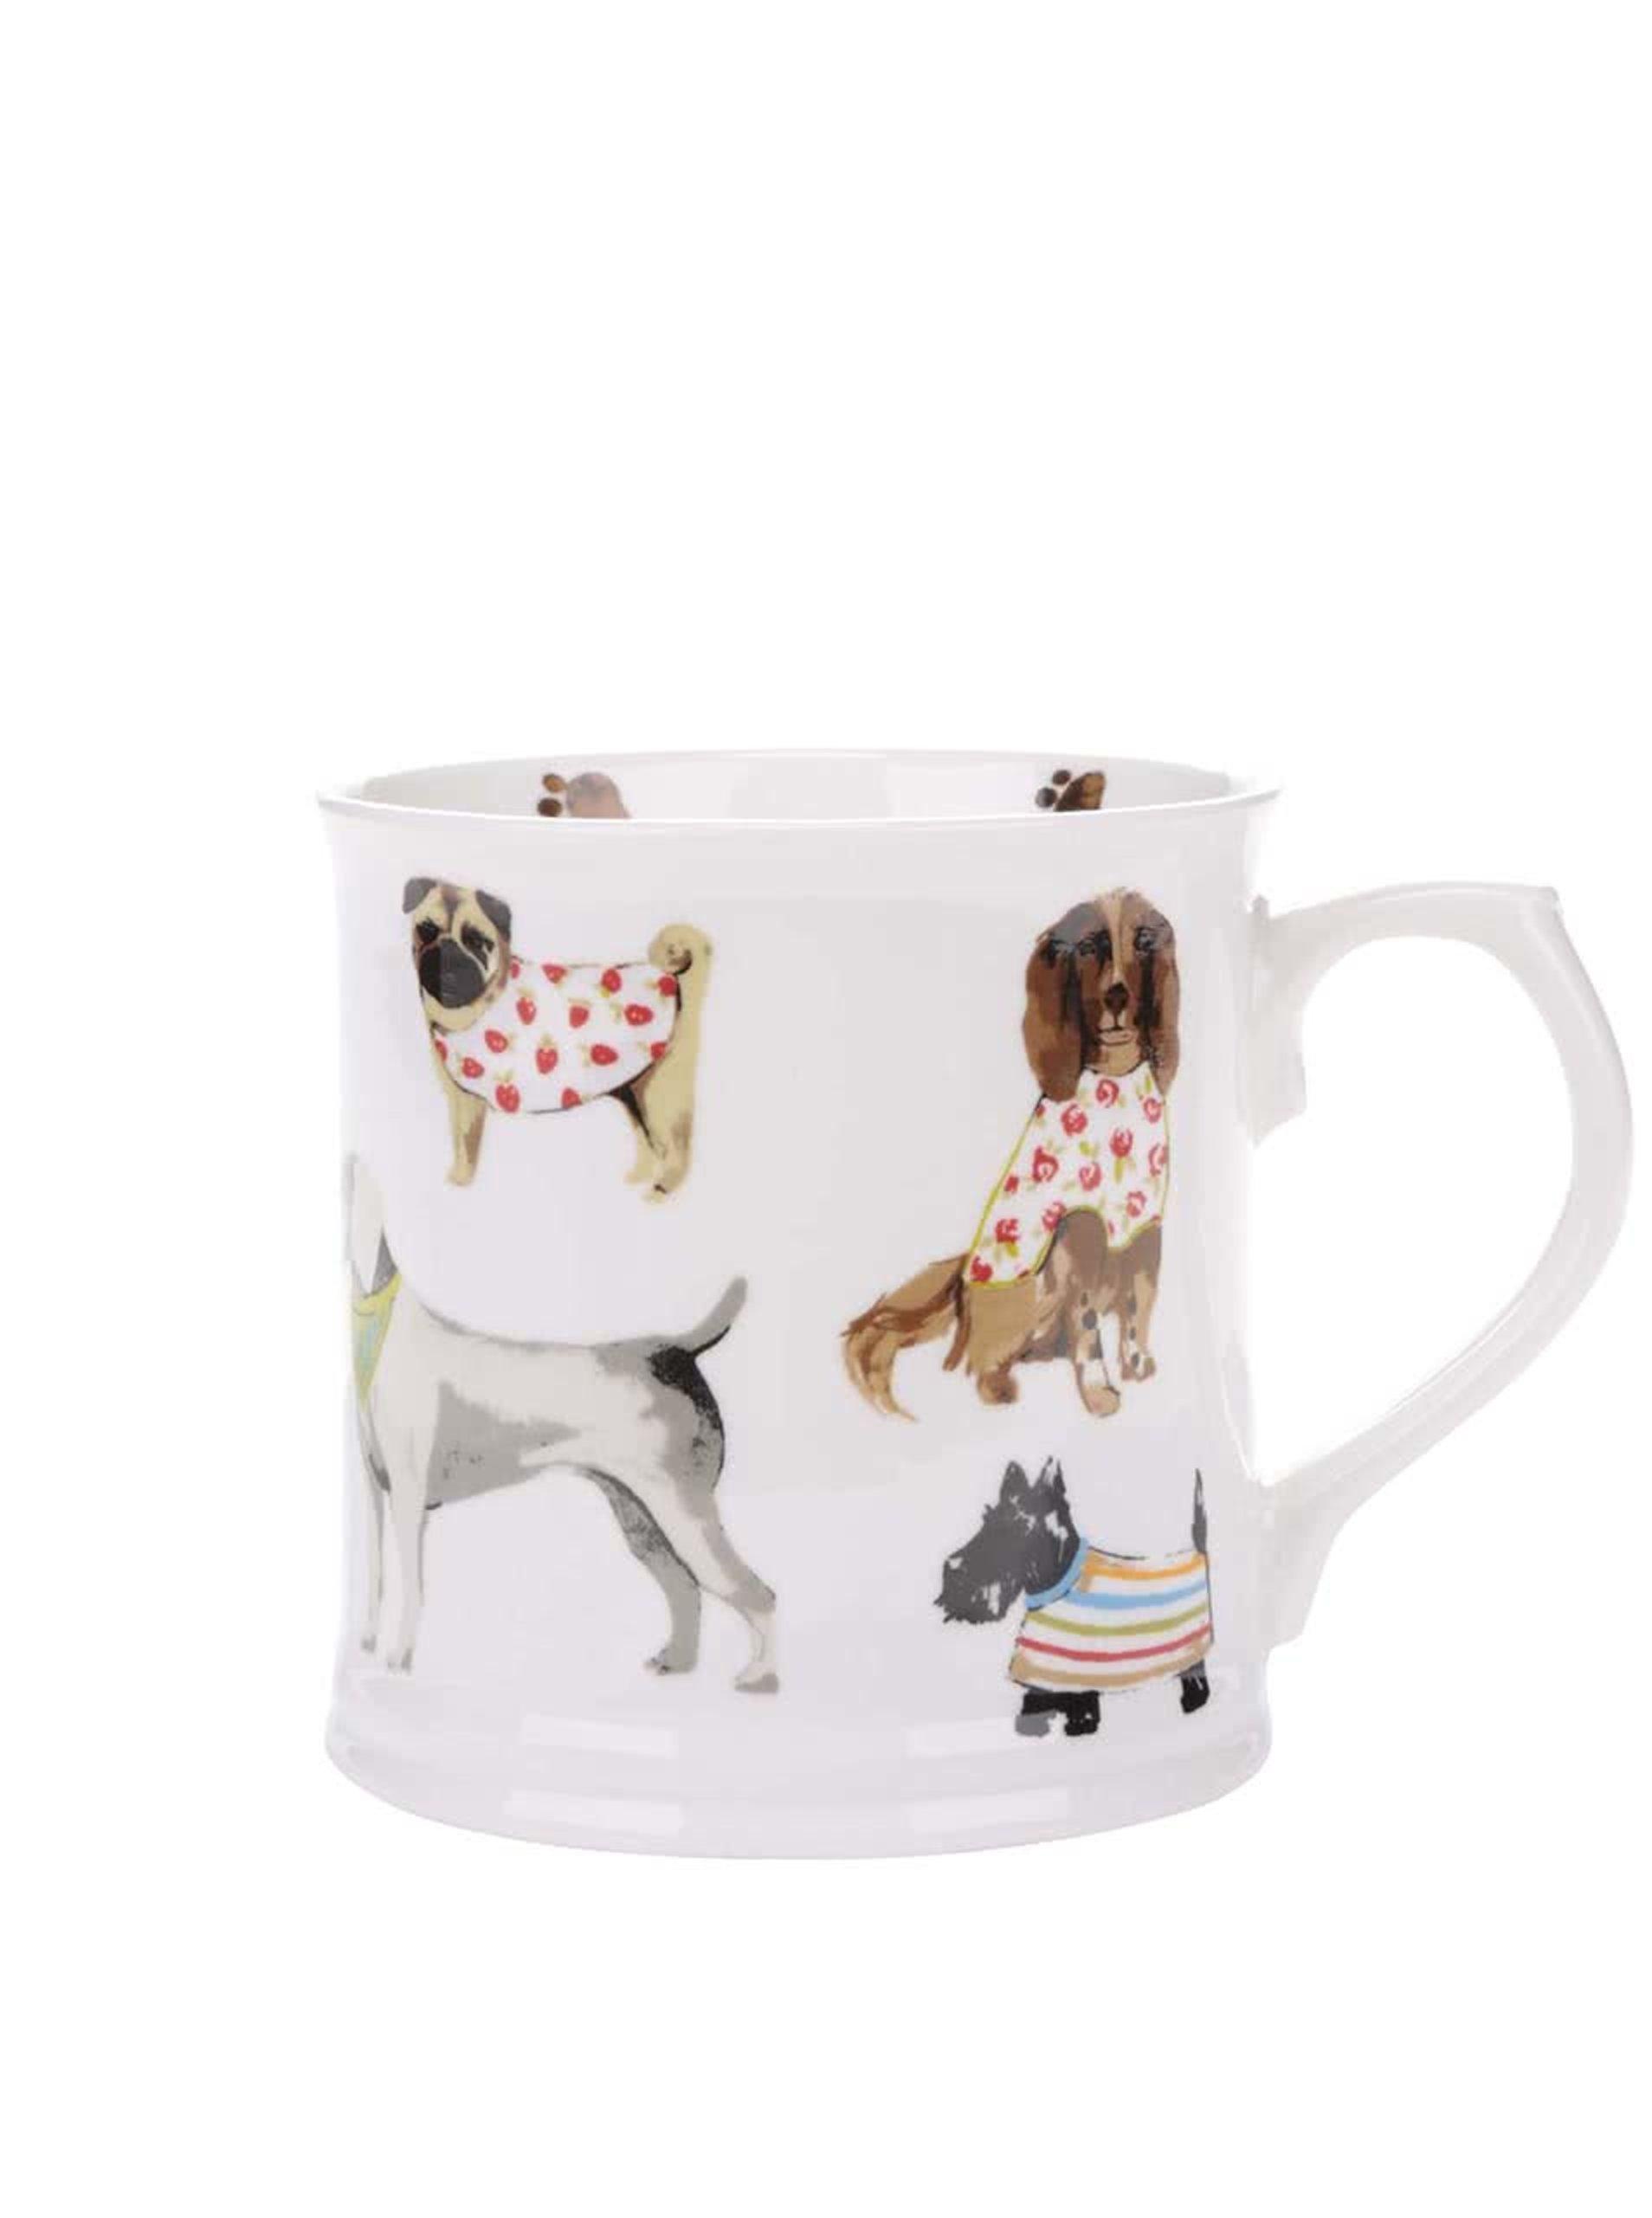 Biely porcelánový hrnček s motívom psov Cooksmart Best in show